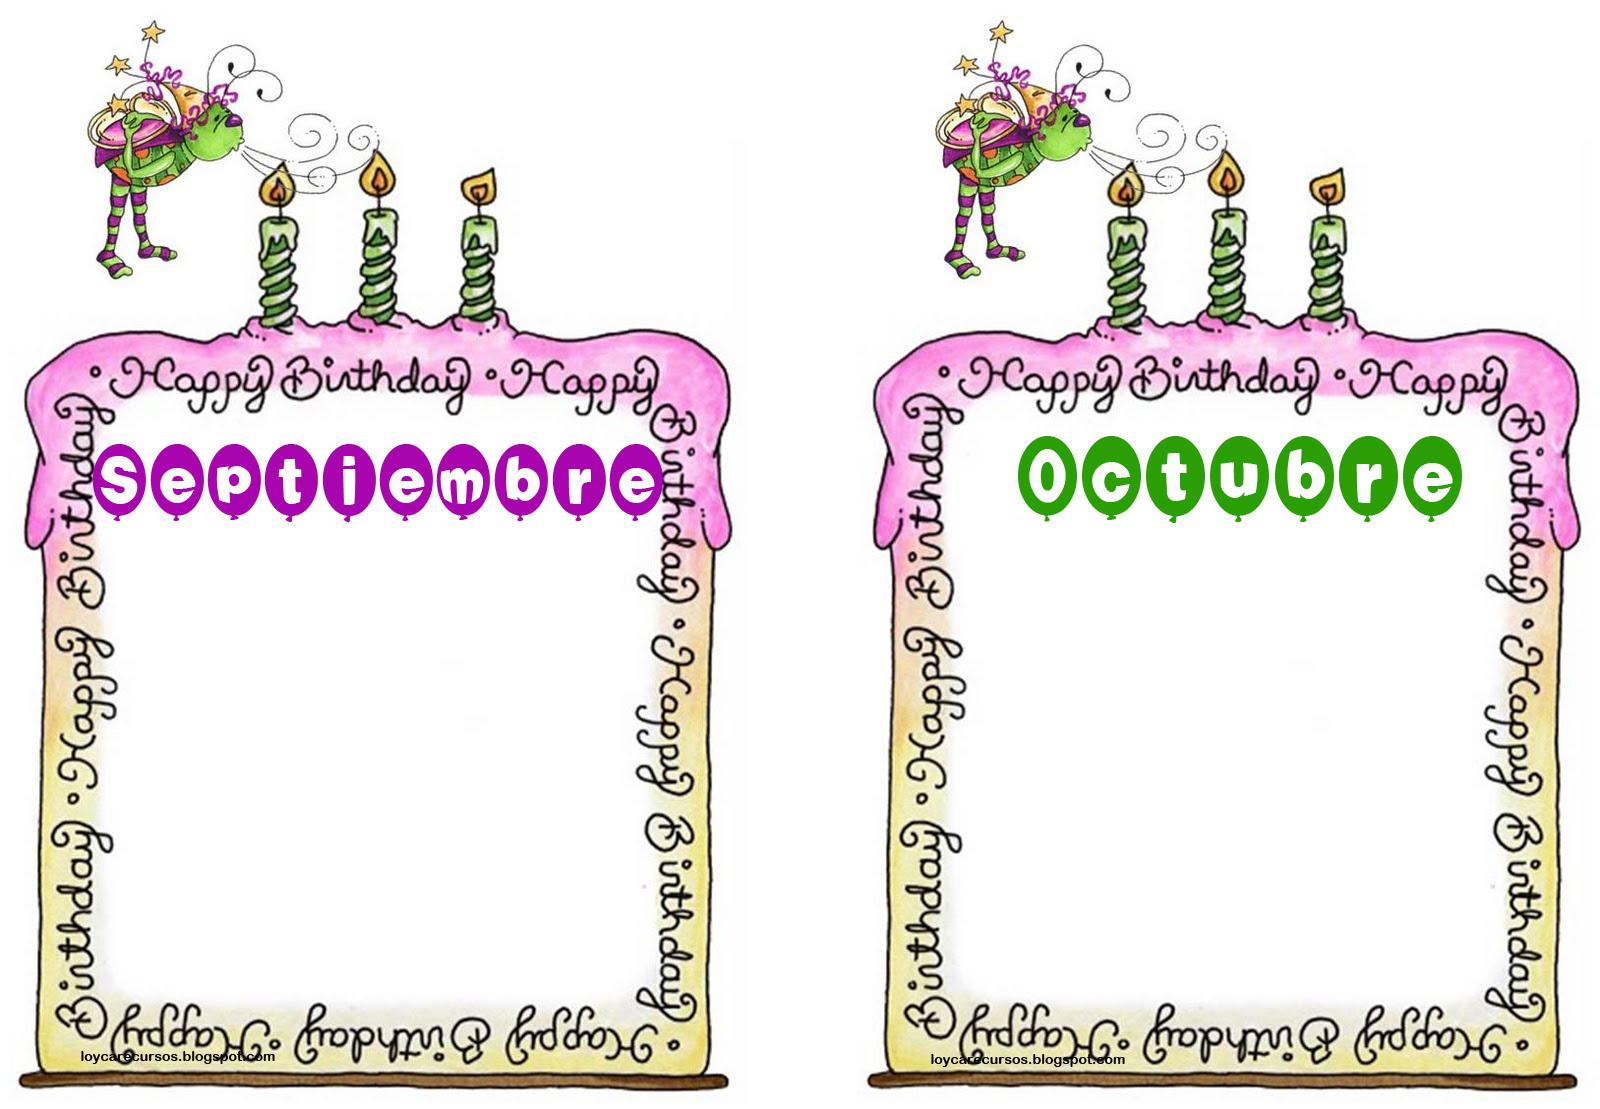 Recursos de educaci n infantil septiembre 2011 for Dibujos para comedor escolar